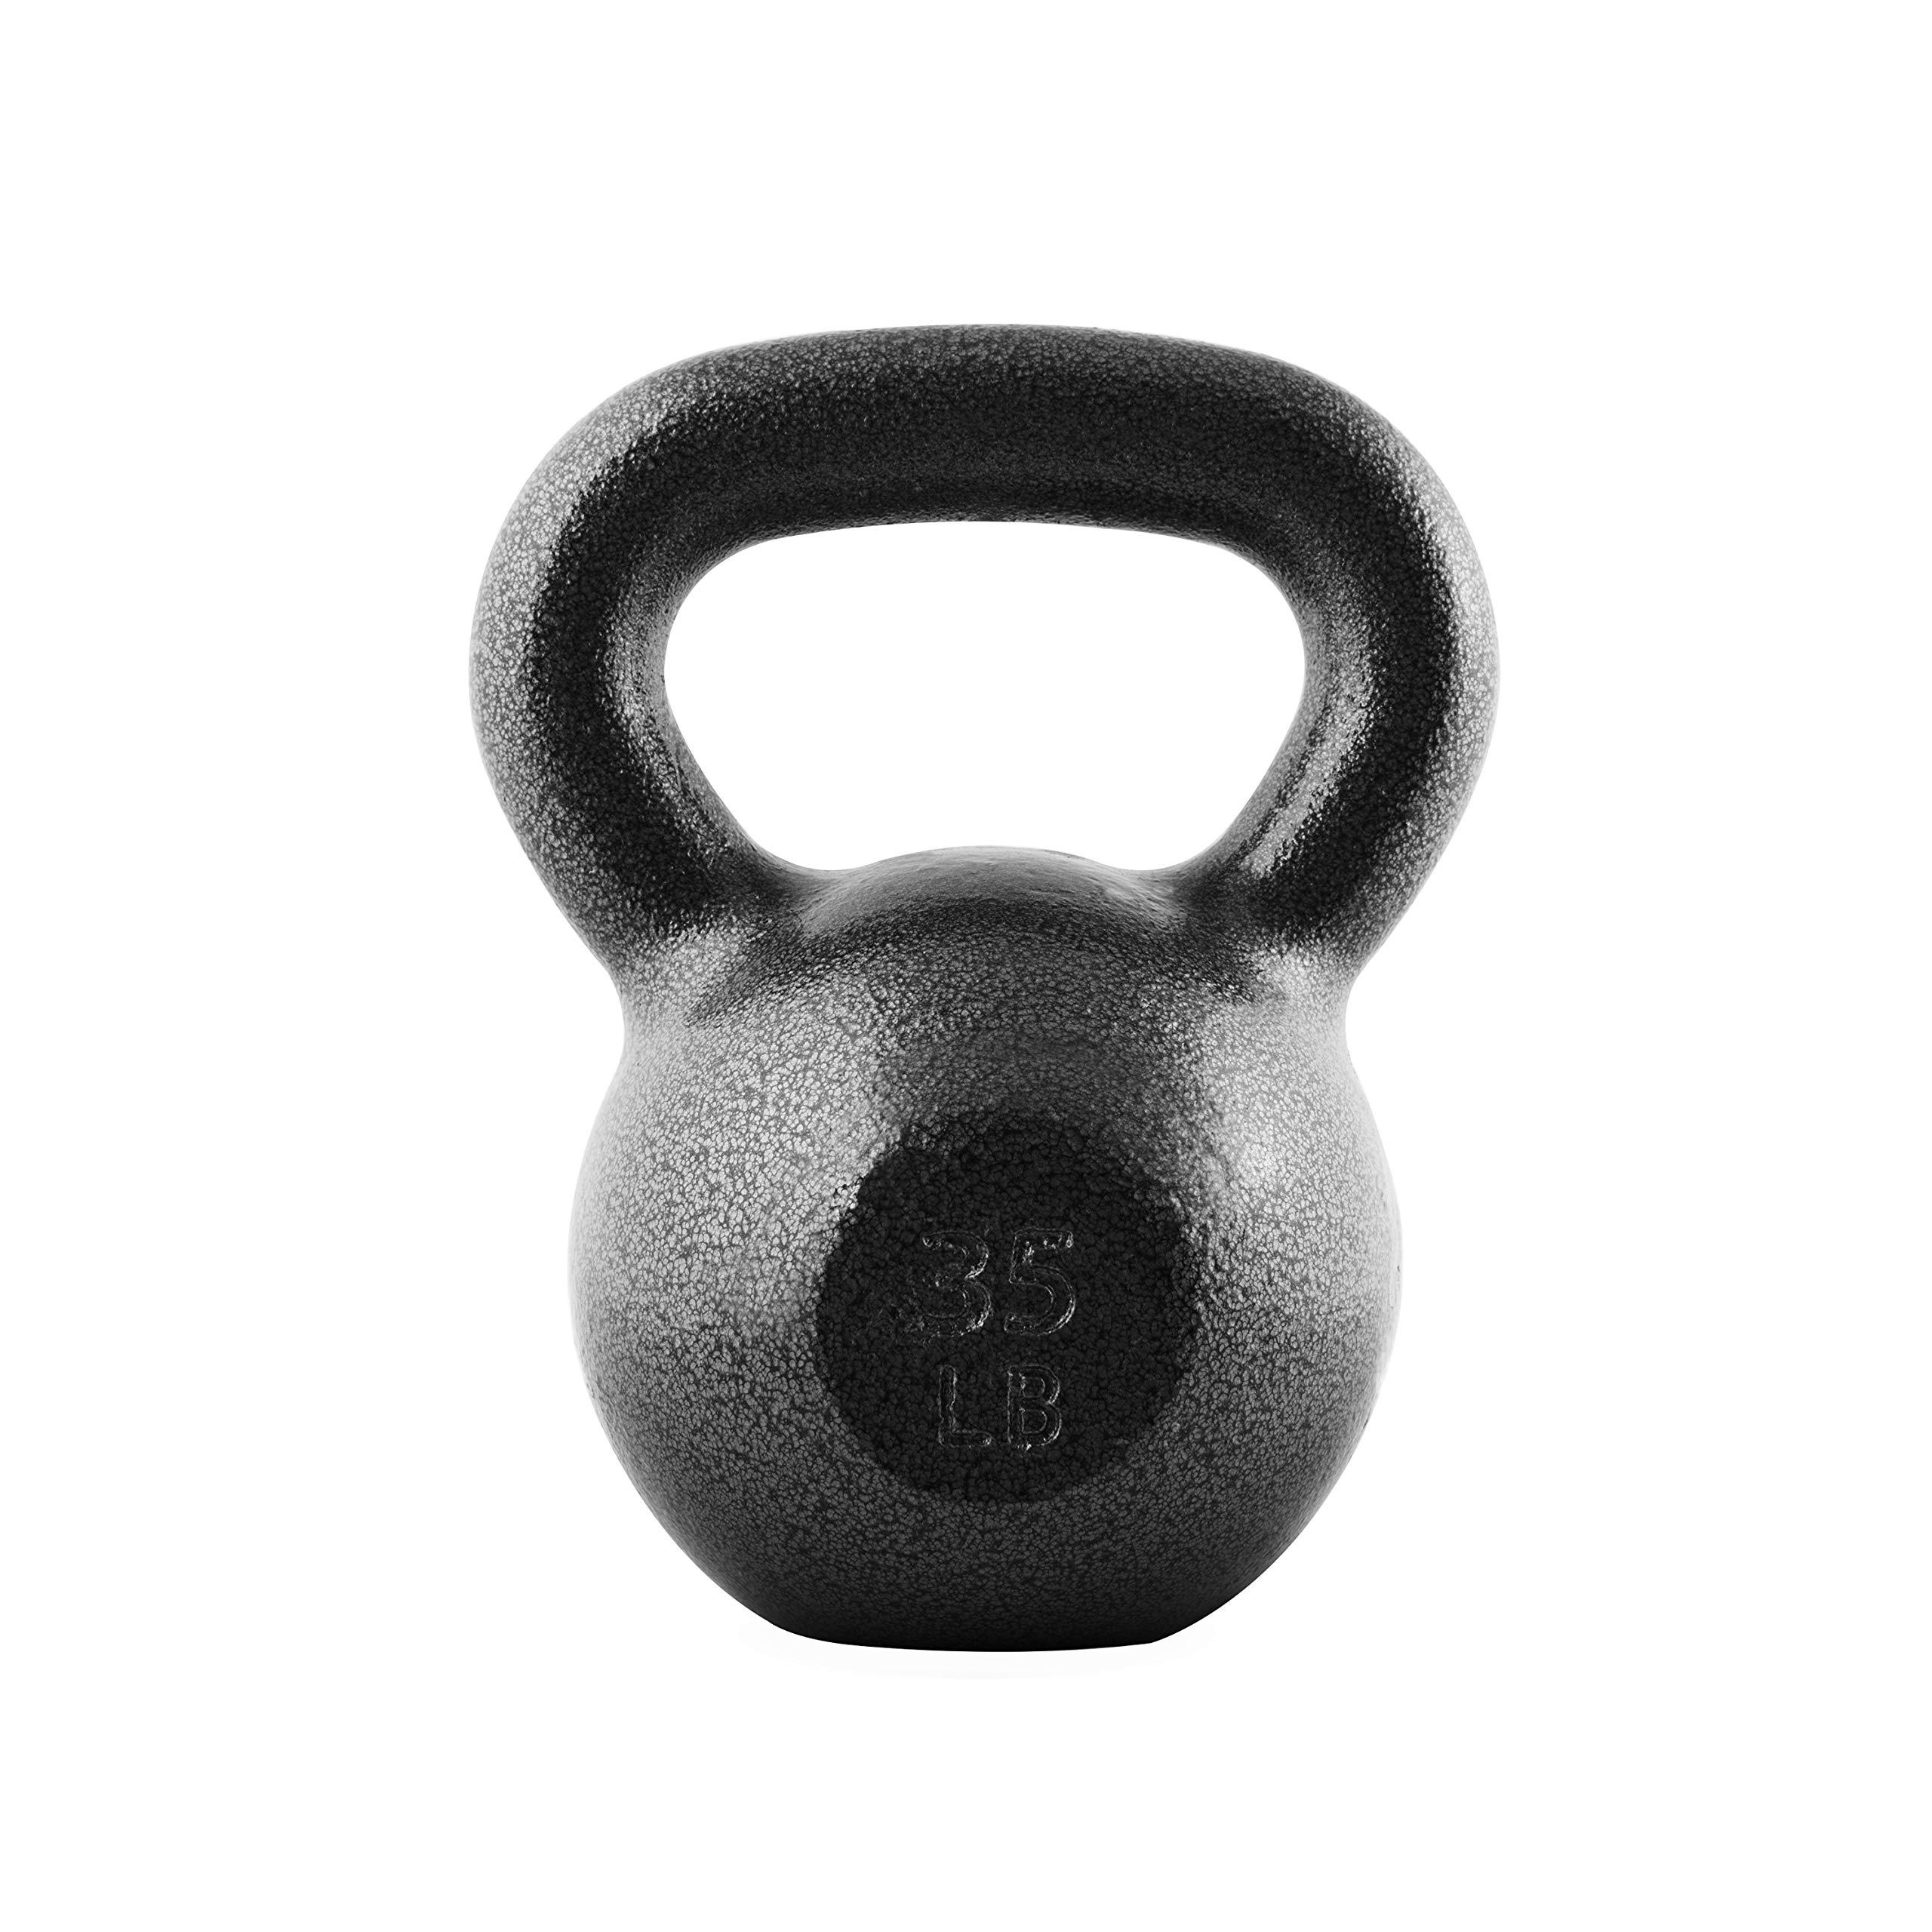 CAP Barbell SDK2B-035 Cast Iron Kettlebell, 35 lb, Black